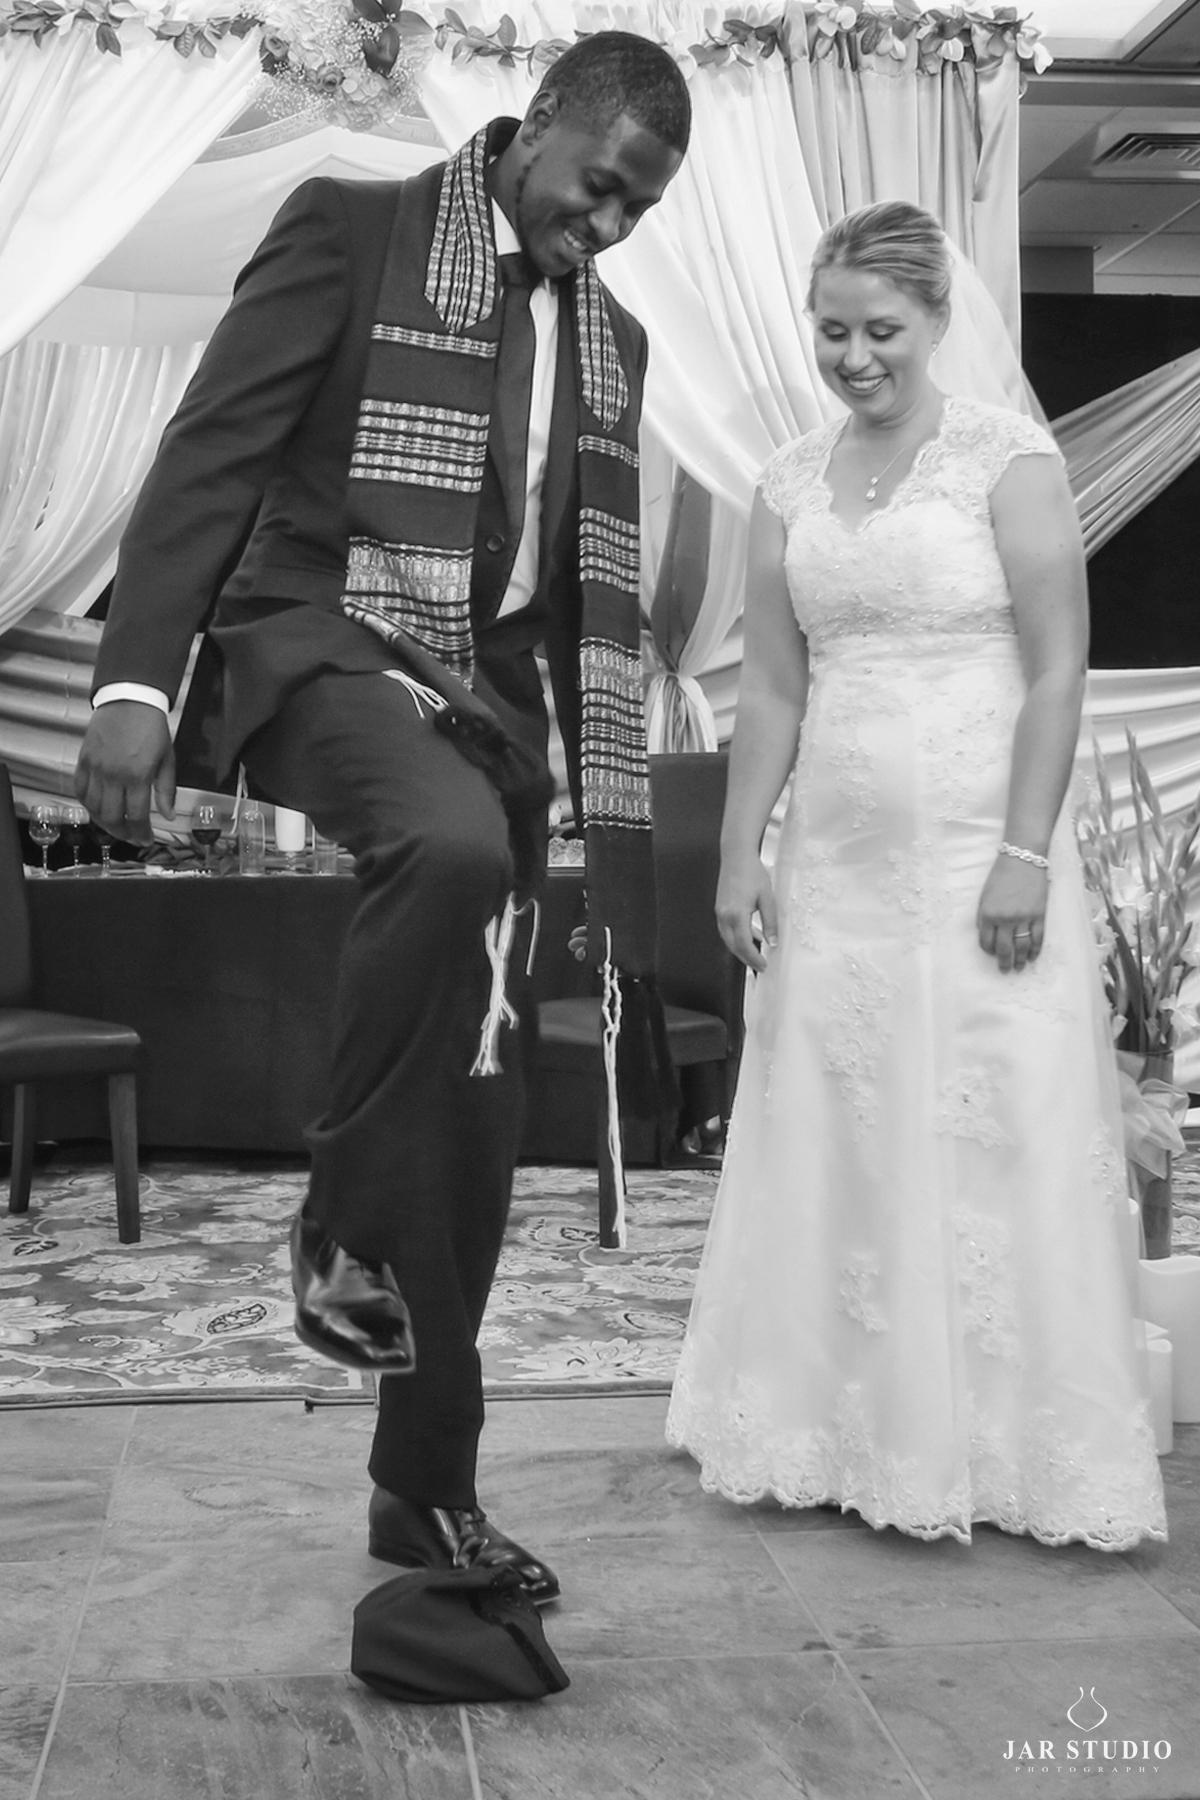 17-mazel-tov-fl-jewish-wedding-moment-jarstudio-photography.jpg